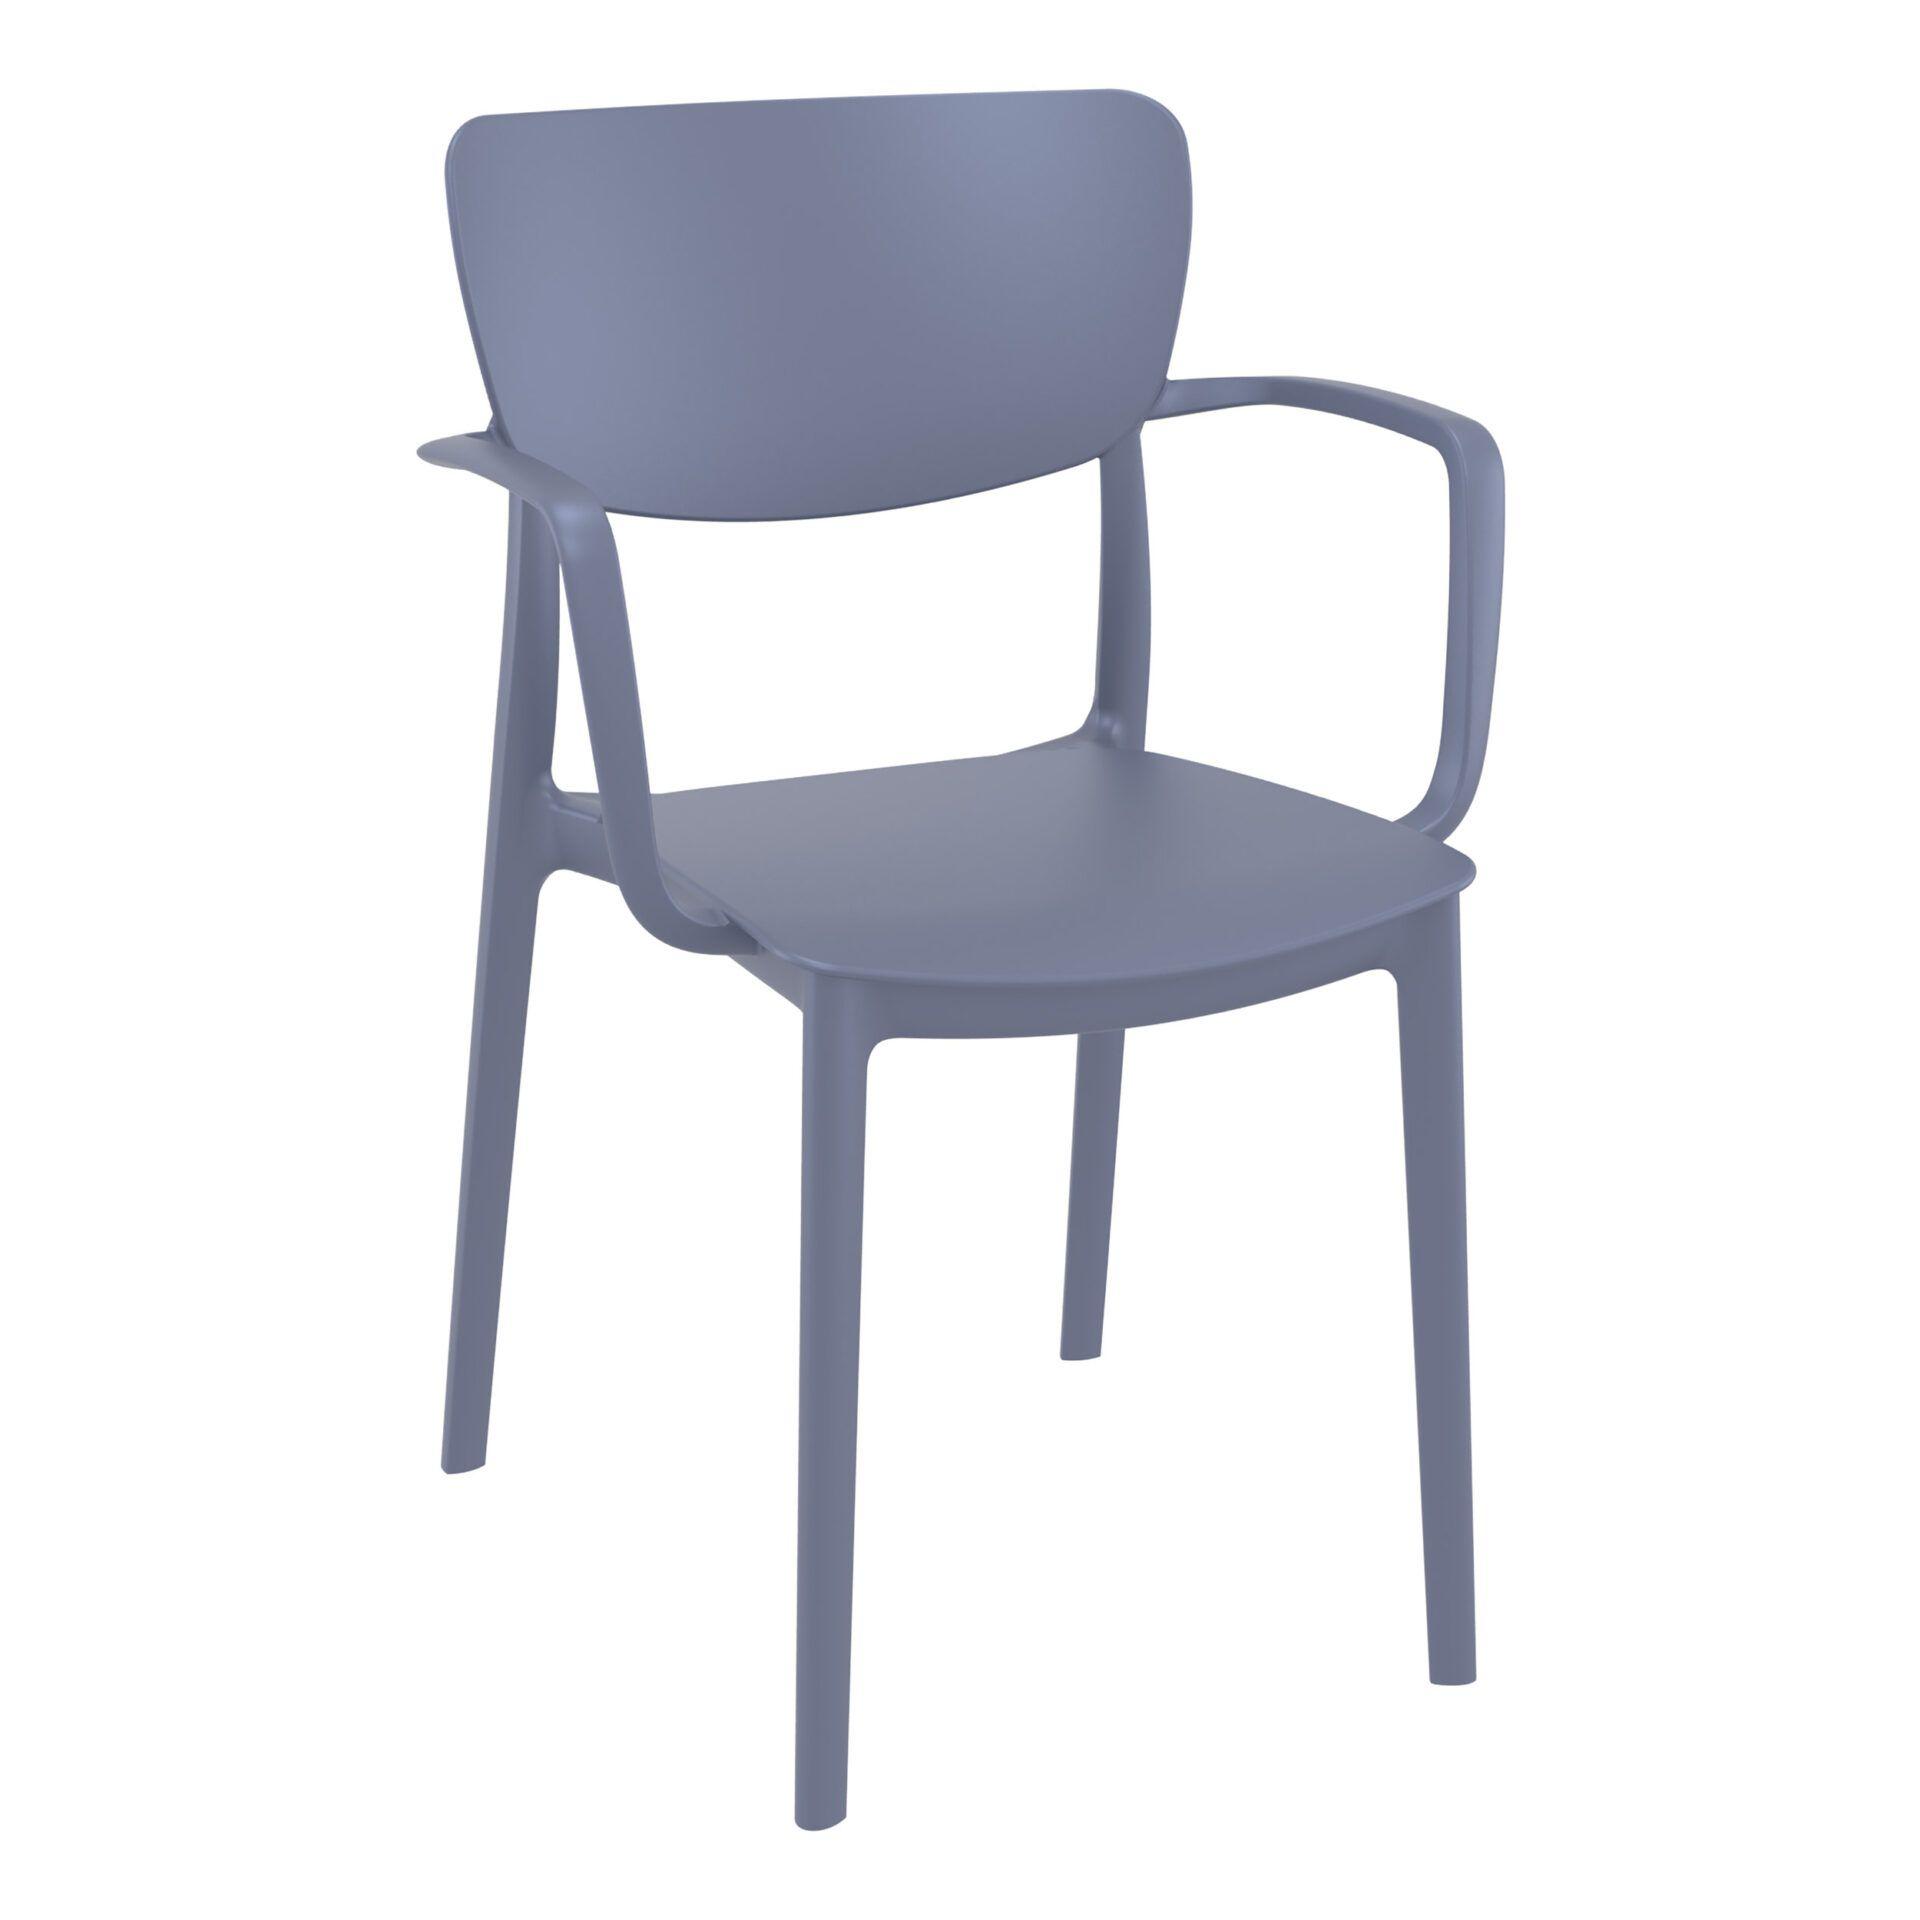 polypropylene hospitality seating lisa armchair darkgrey front side